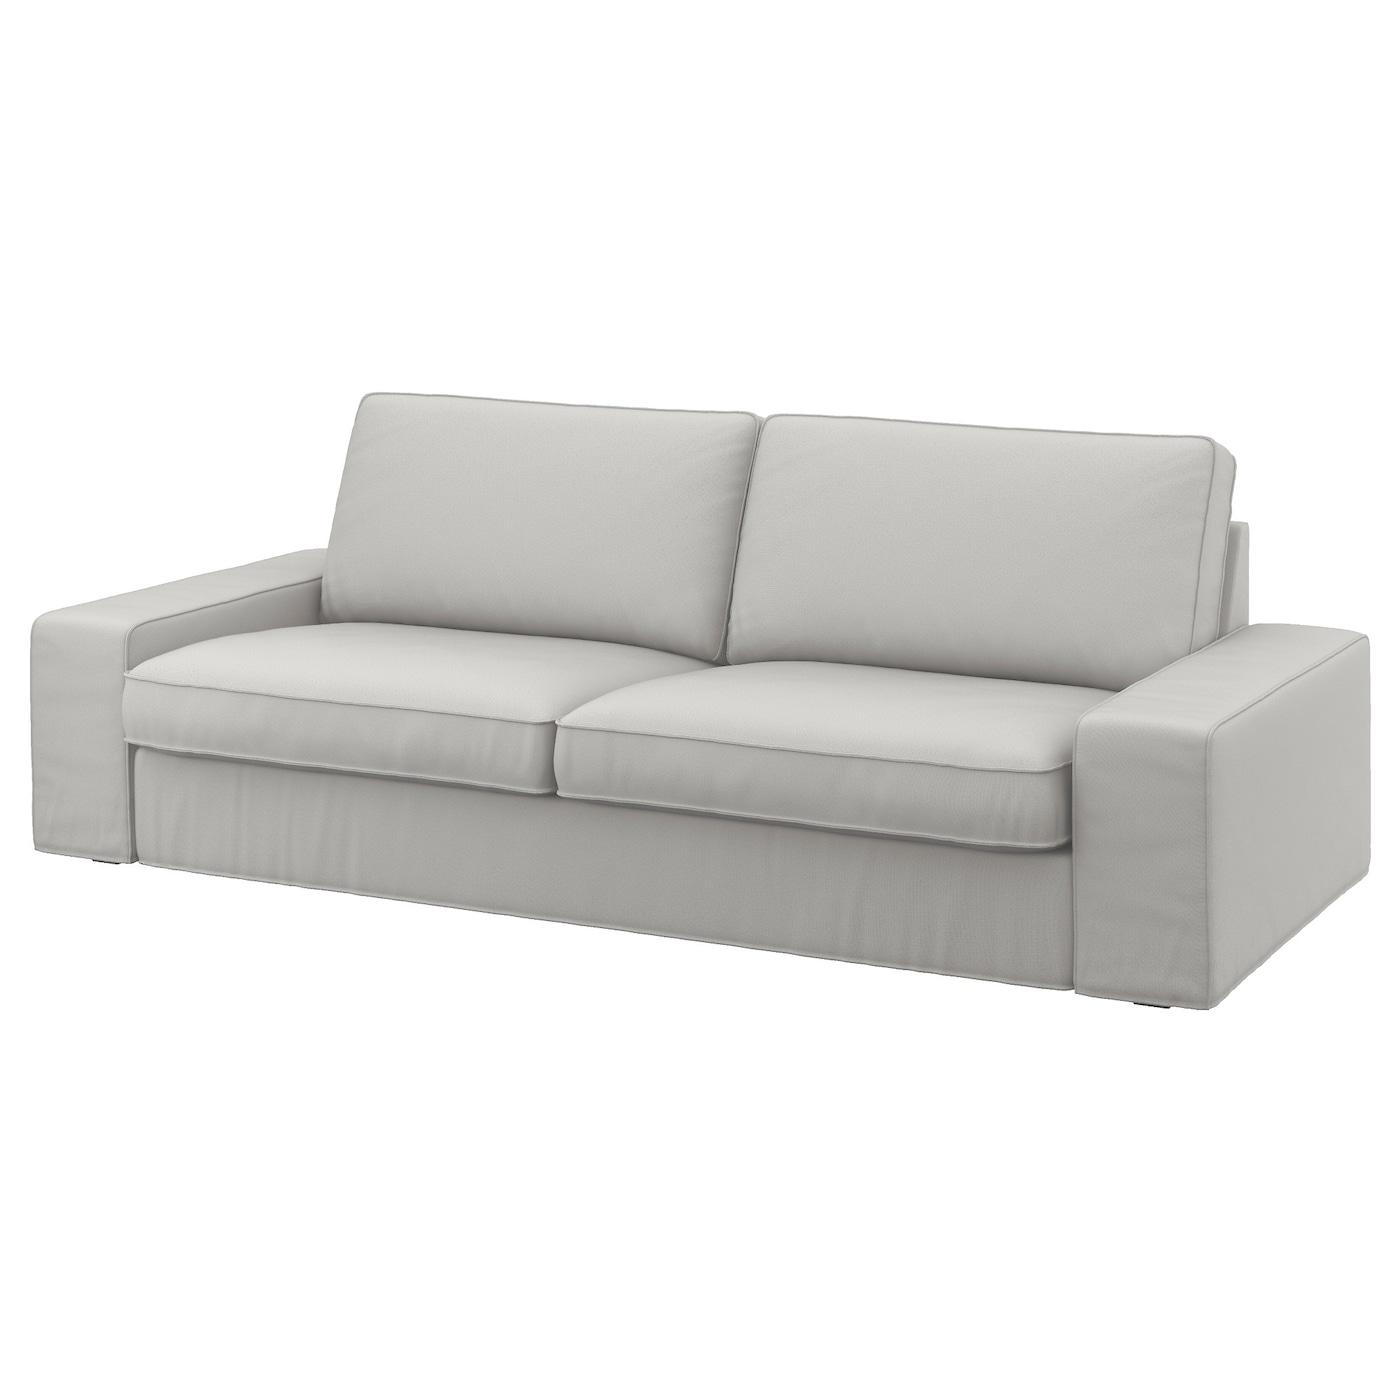 kivik three seat sofa ramna light grey ikea sofa back covers online india sofa back cover design